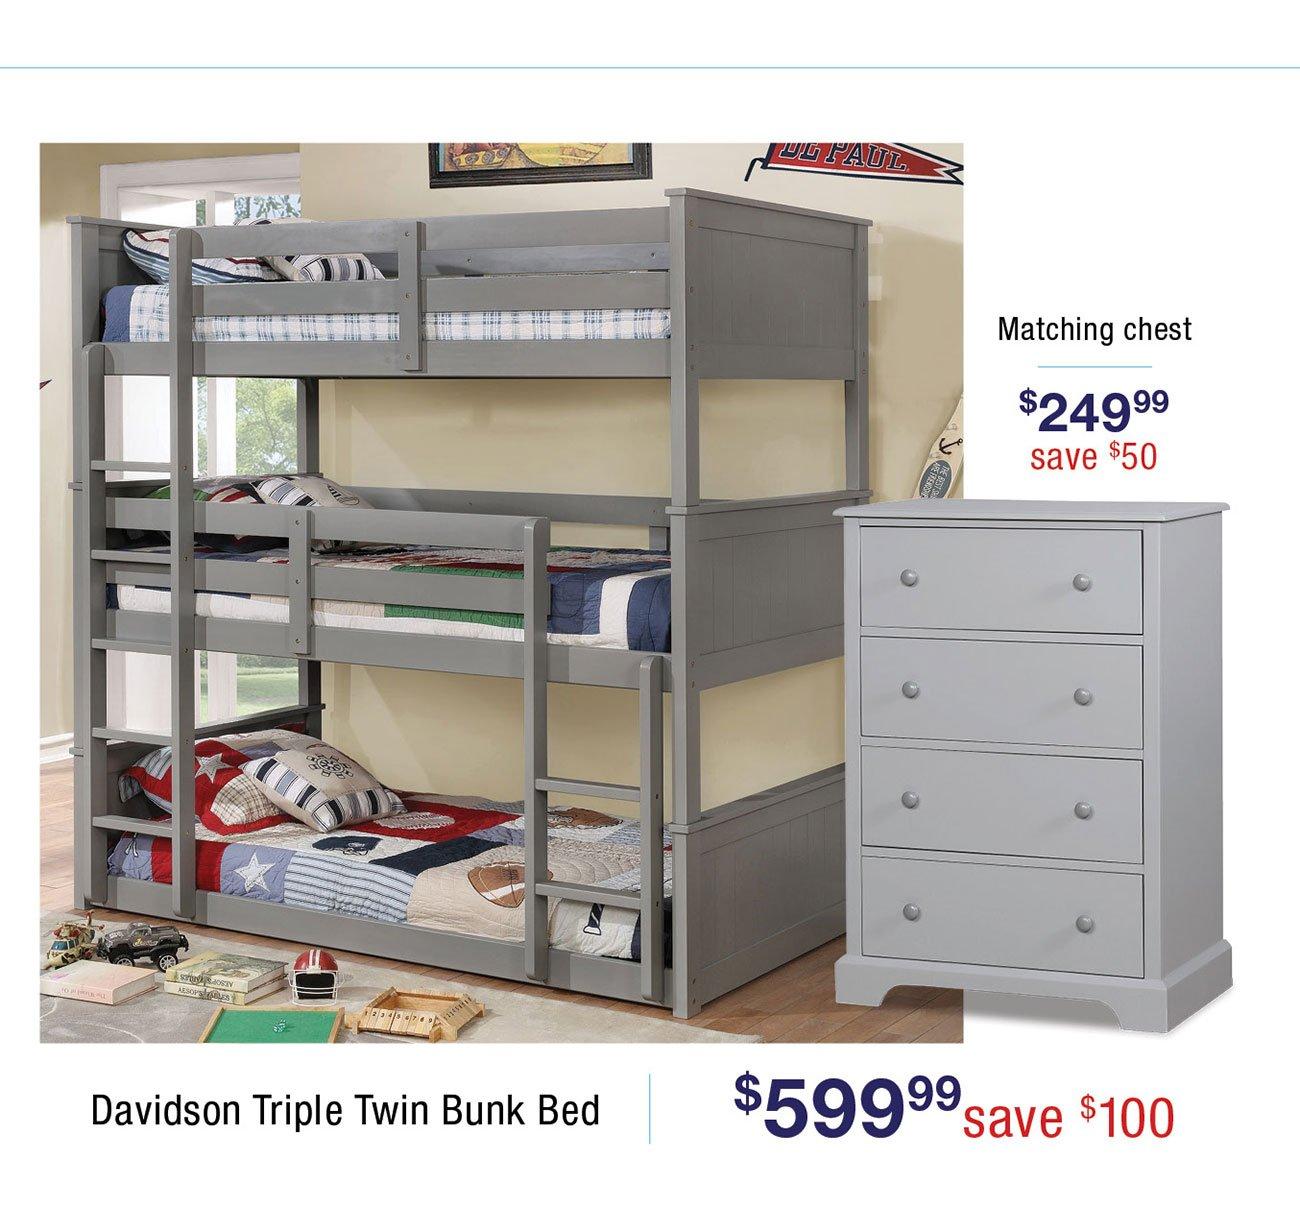 Davidson-triple-twin-bunkbed